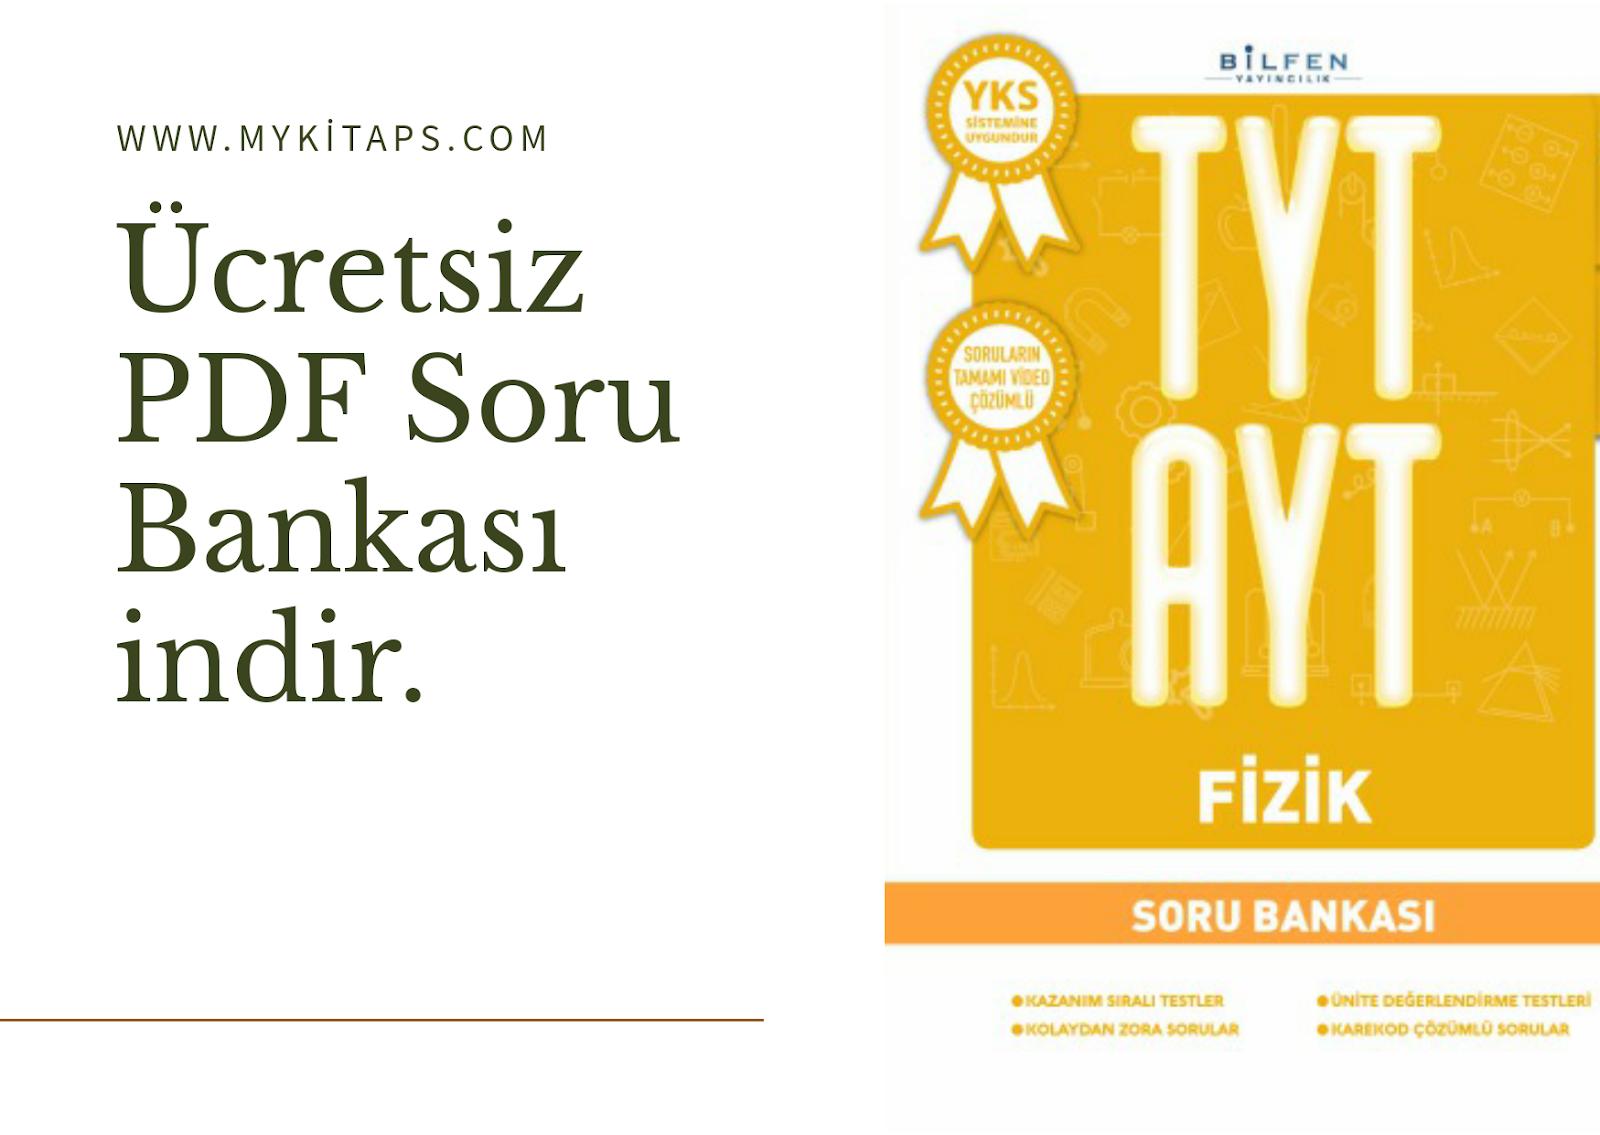 Bilfen TYT-AYT Fizik Soru Bankası 2018-2019